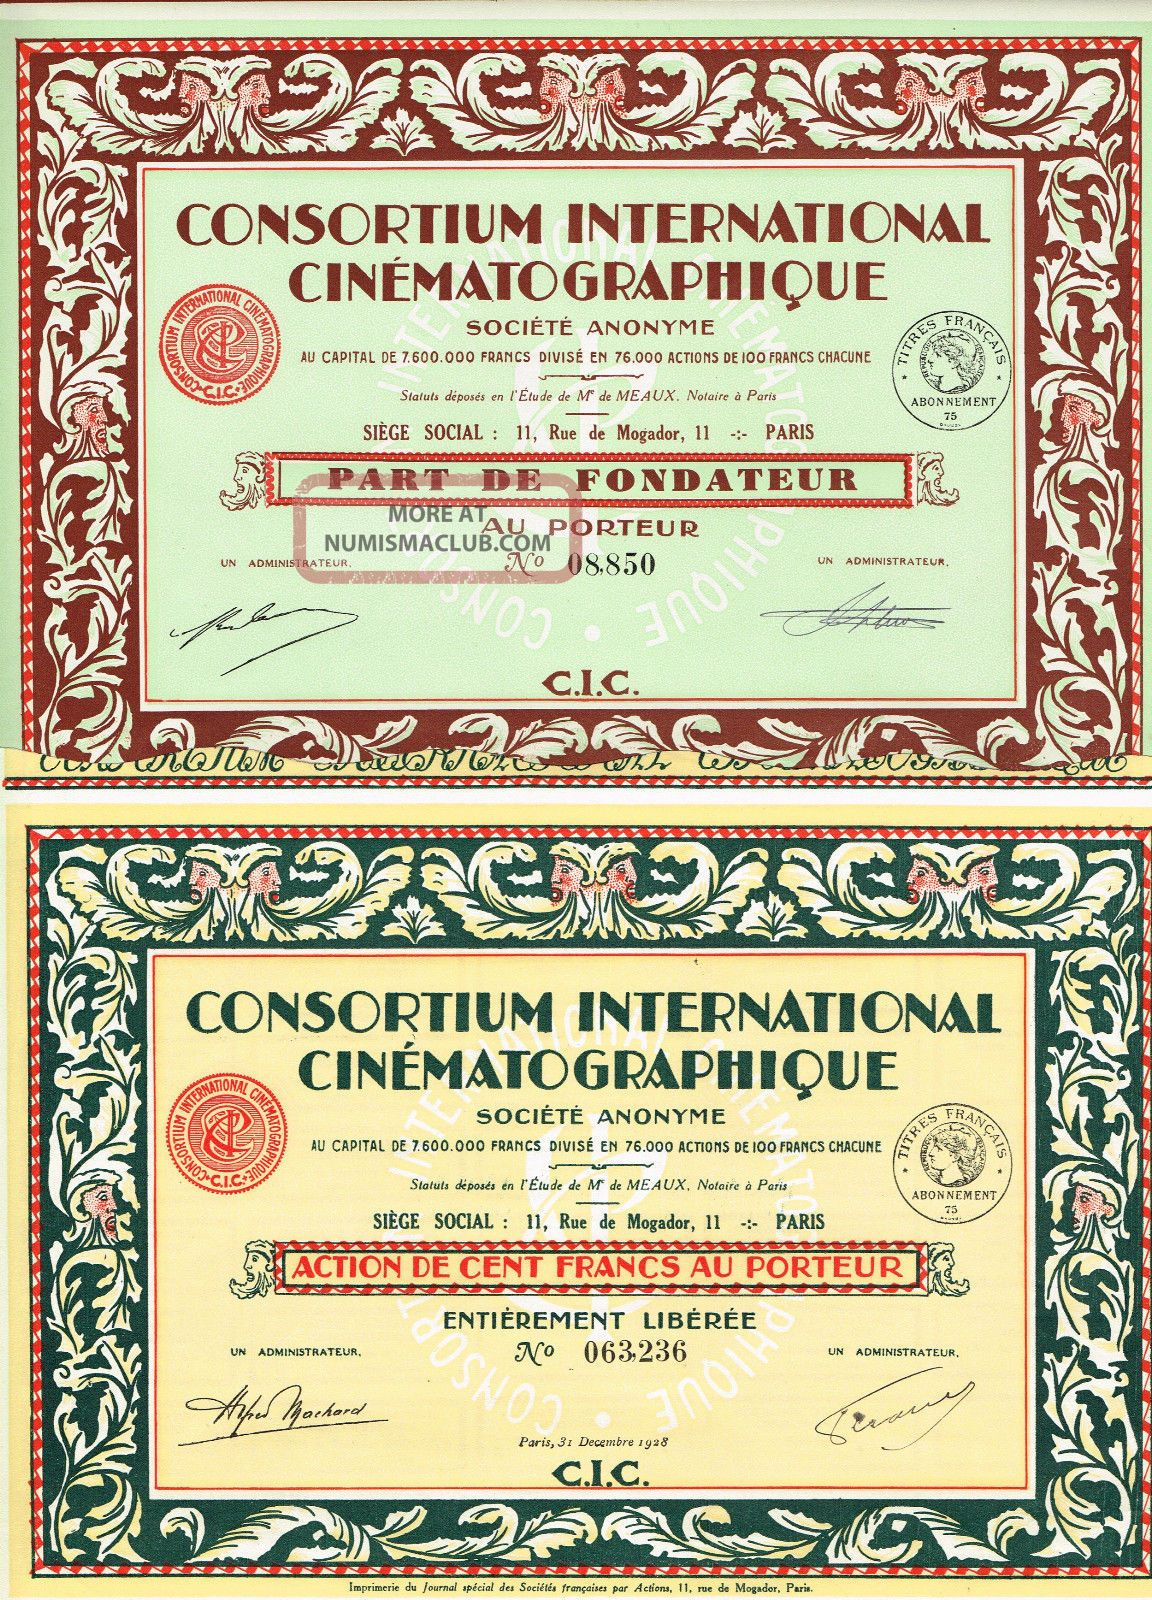 France Cinematography International Consortium Stock Certificate X 2 Types World photo